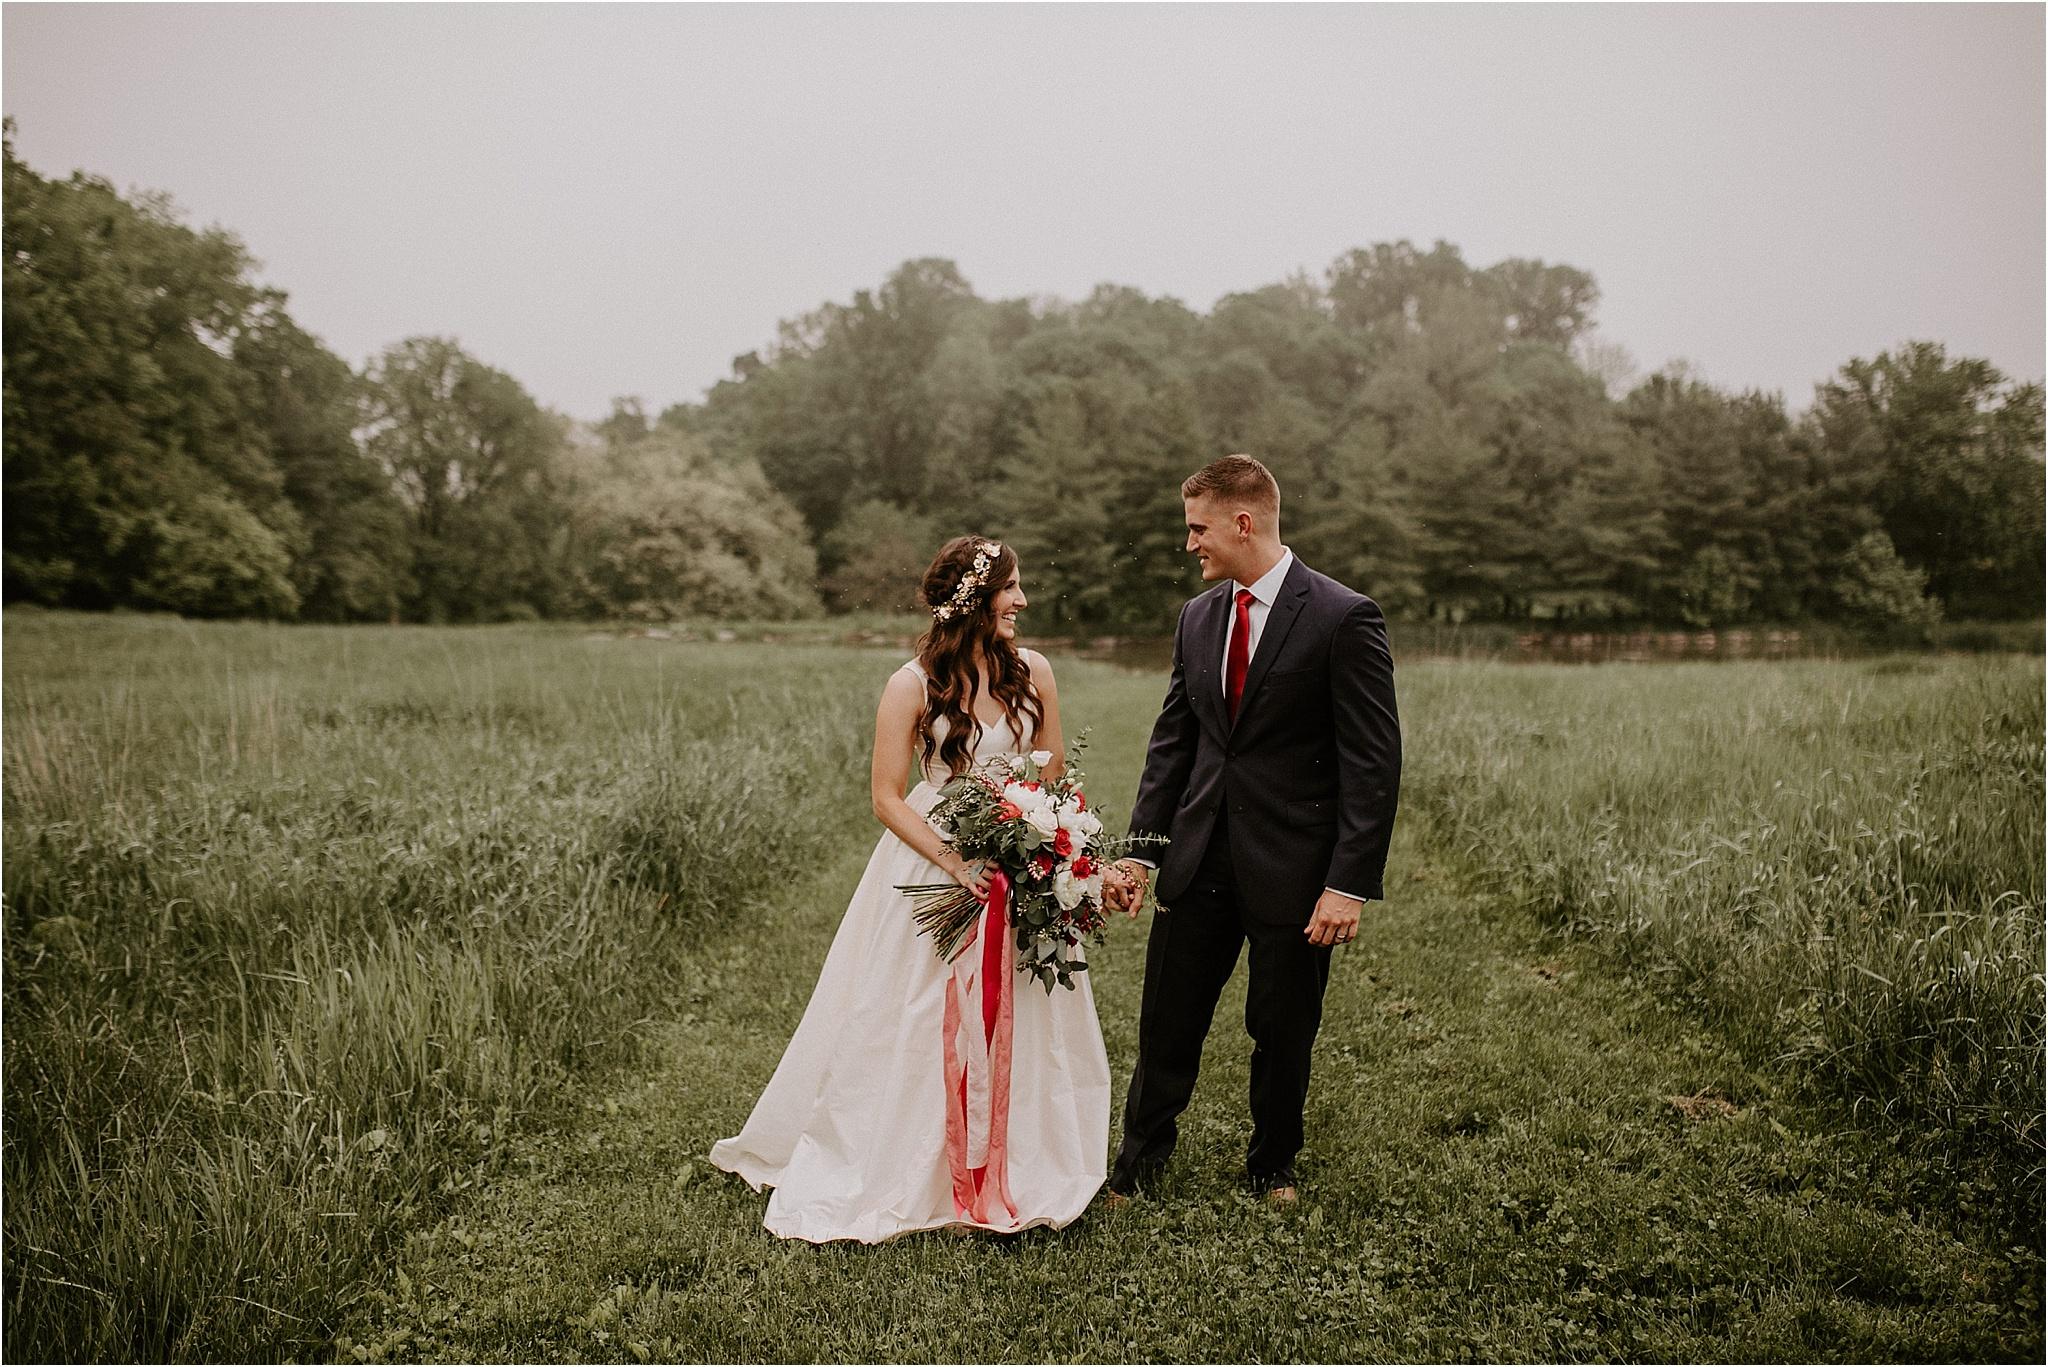 Sarah_Brookhart_Farm_at_Eagles_Ridge_Wedding_Photographer_0059.jpg